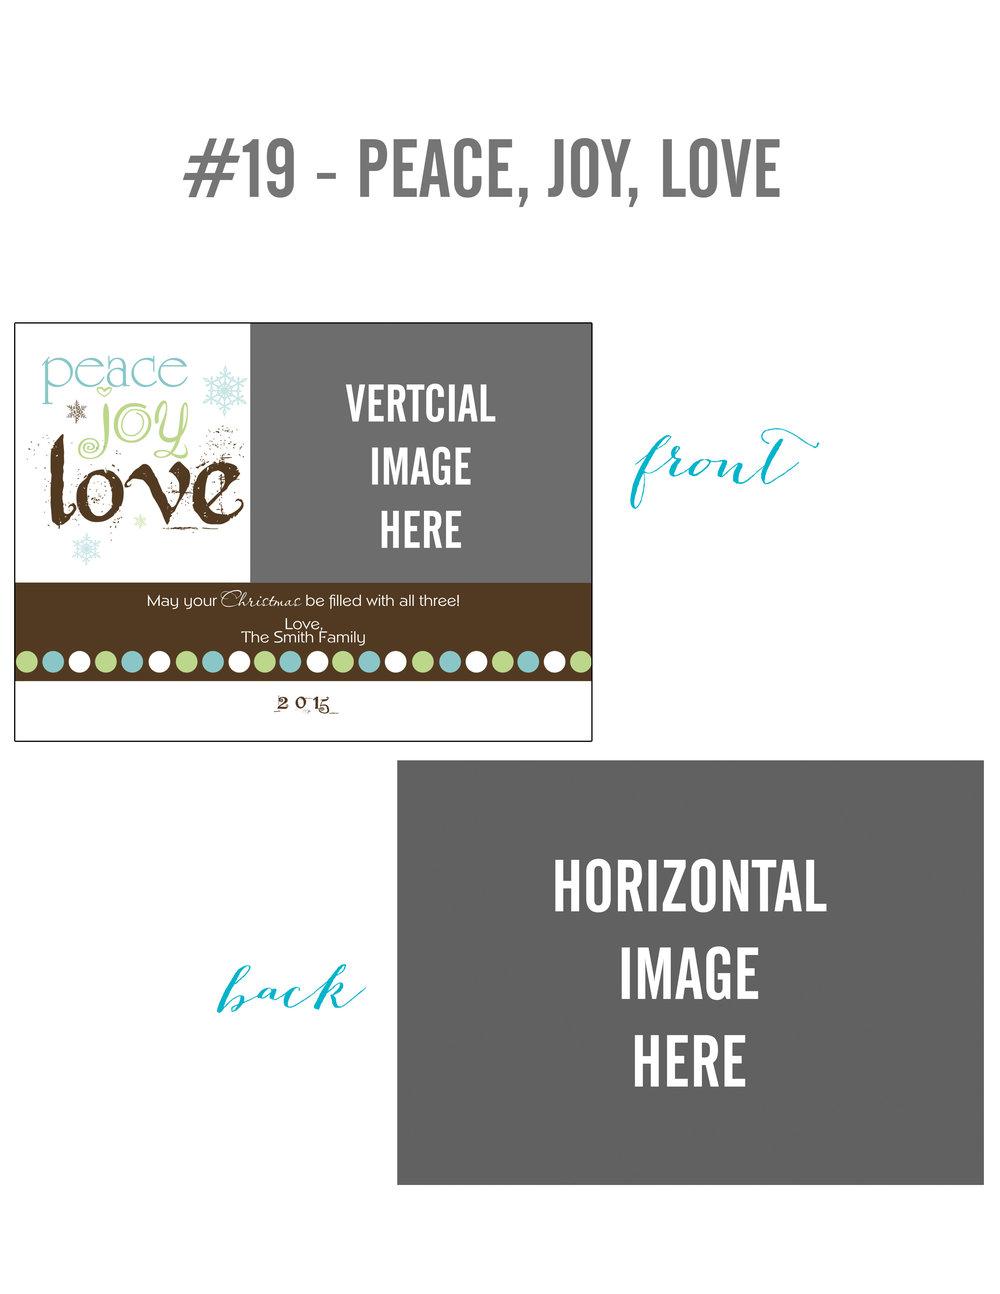 19-PEACE, LOVE, JOY.jpg